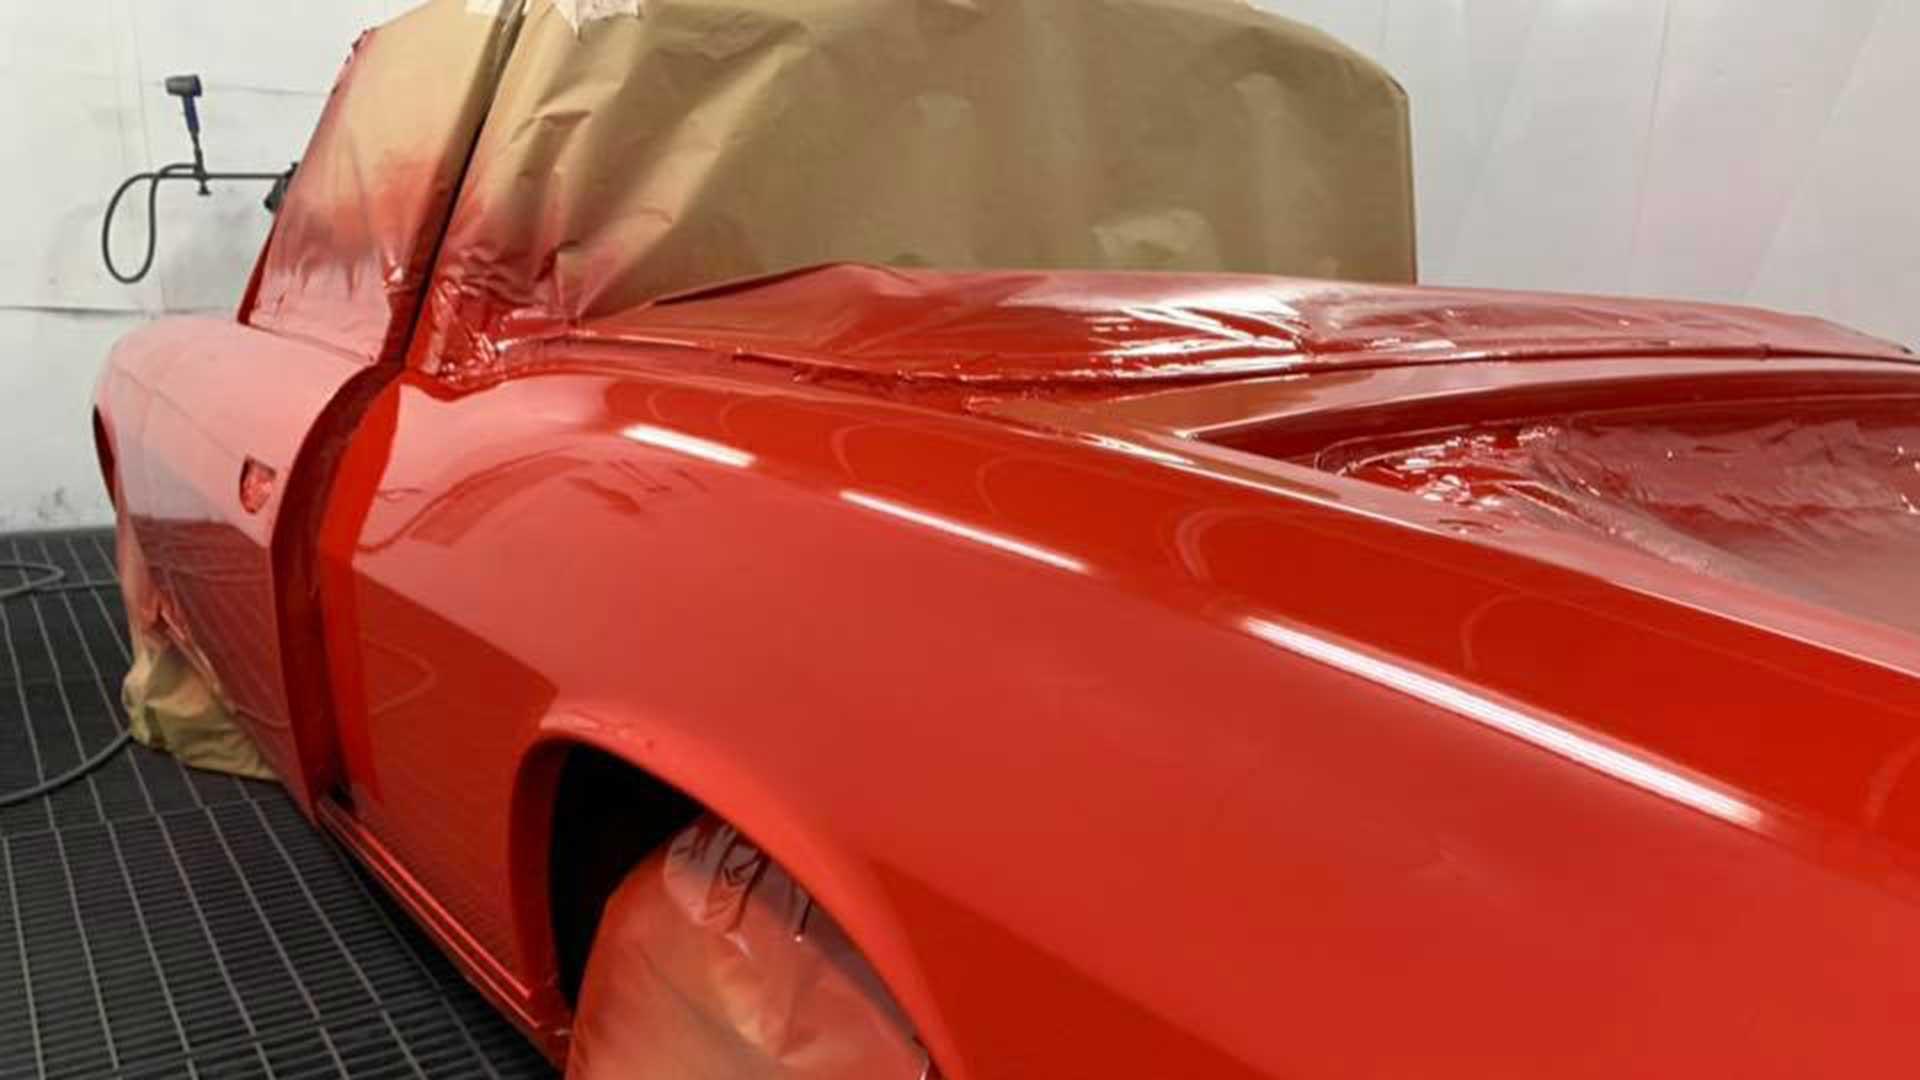 A red car being re-sprayed